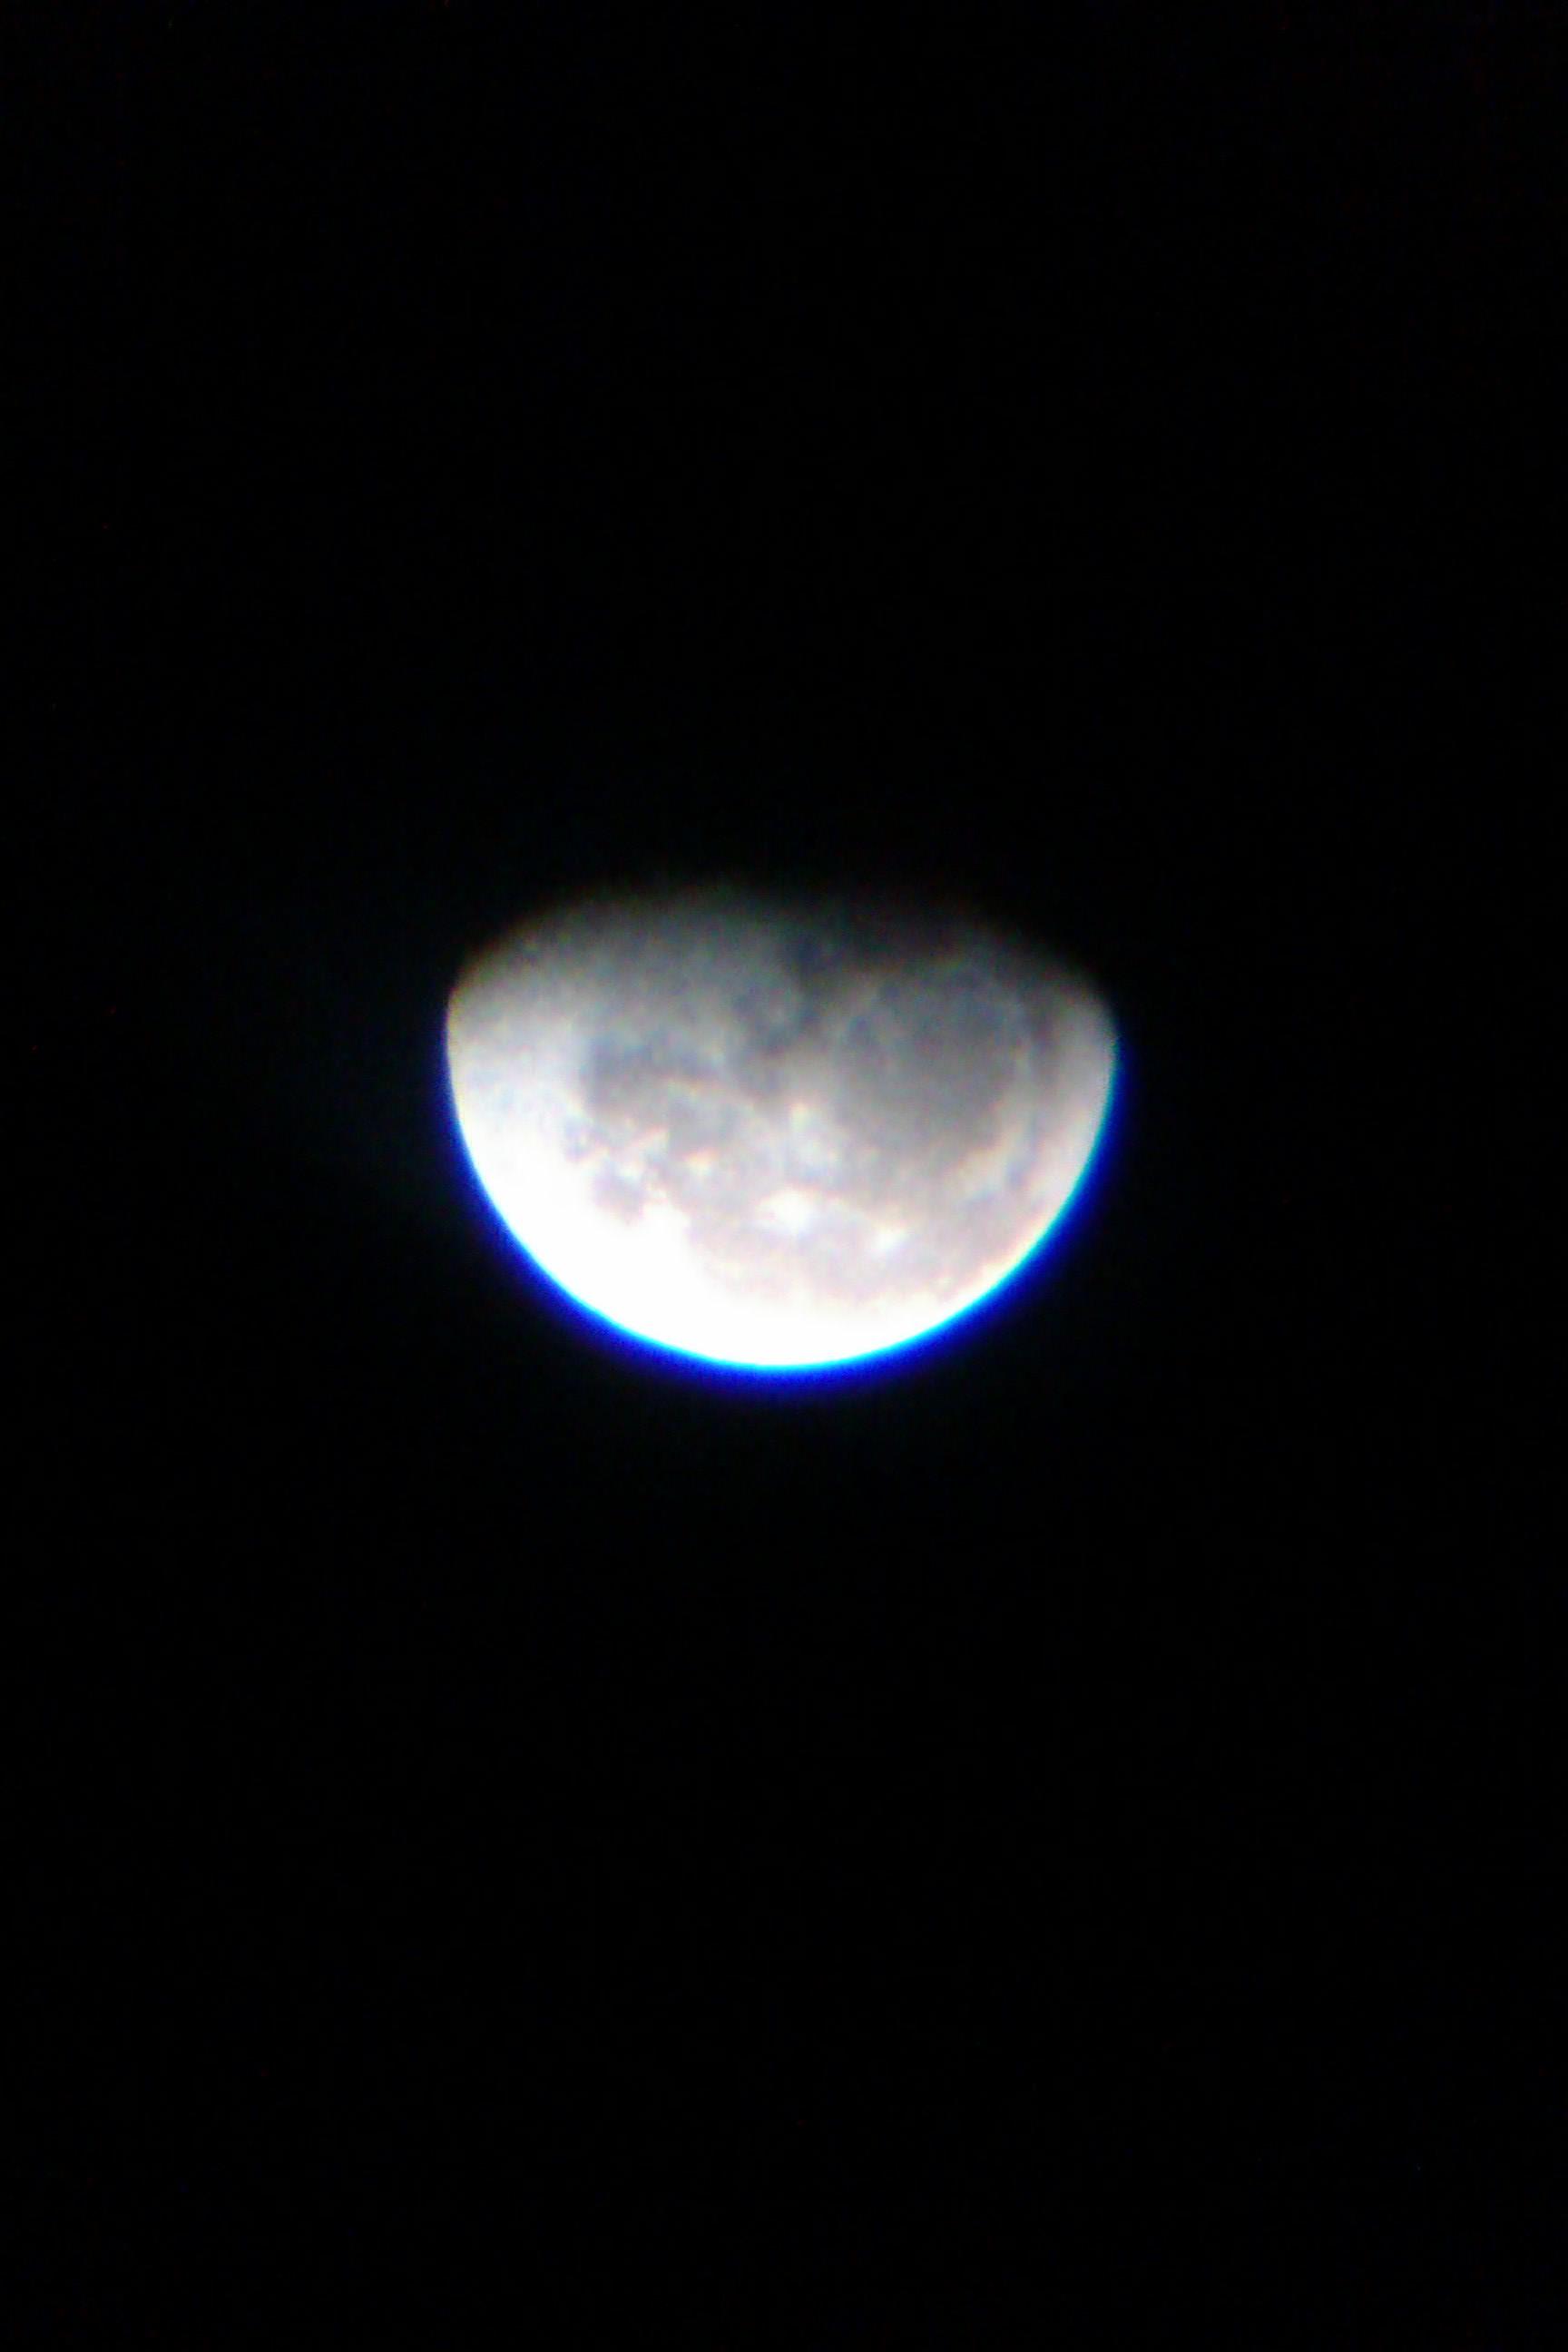 myblog.9e.cz/teleskop/M5.jpg